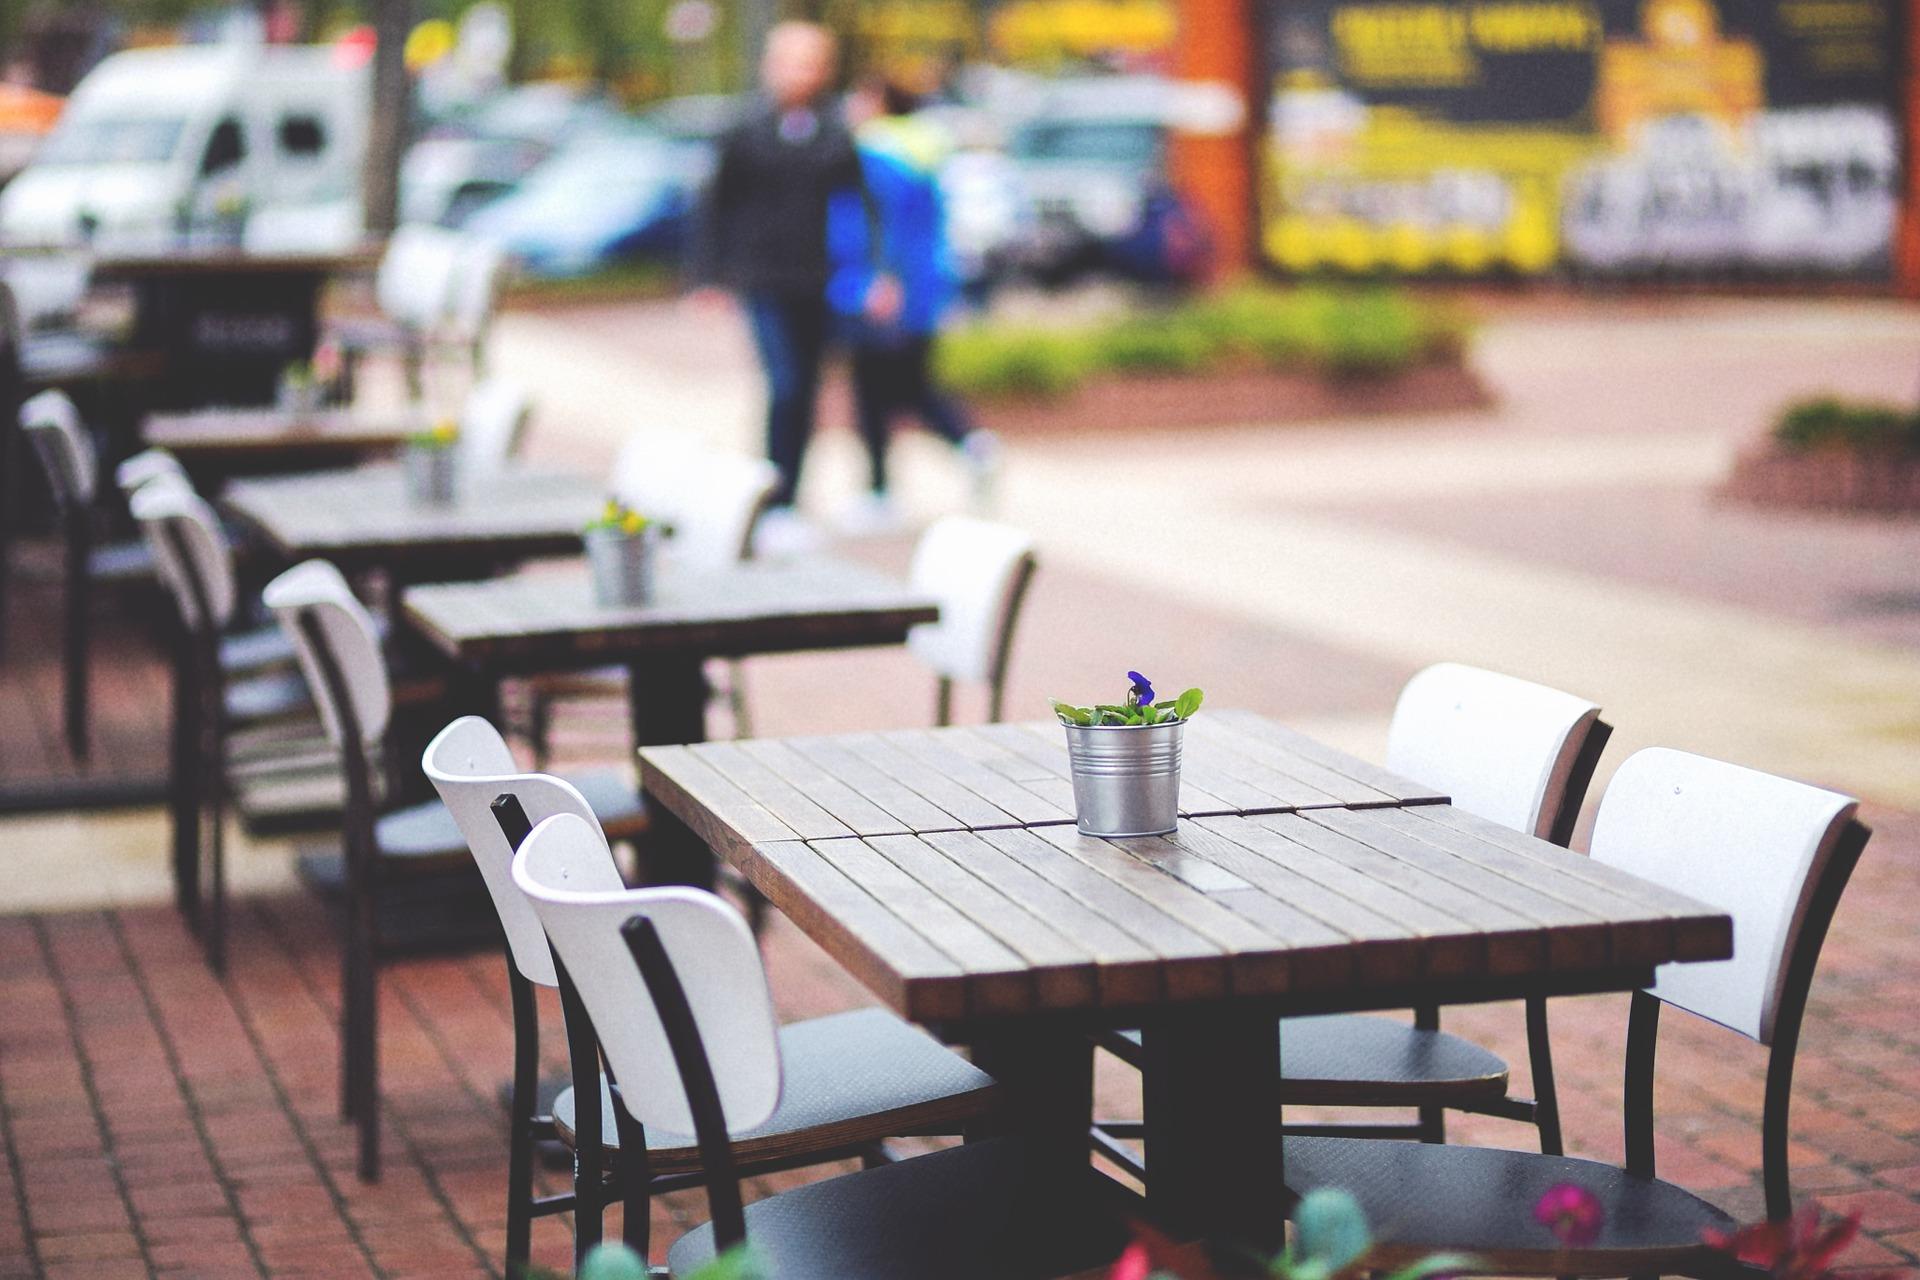 В Севастополе кафе и ресторанам разрешат открыть летние площадки